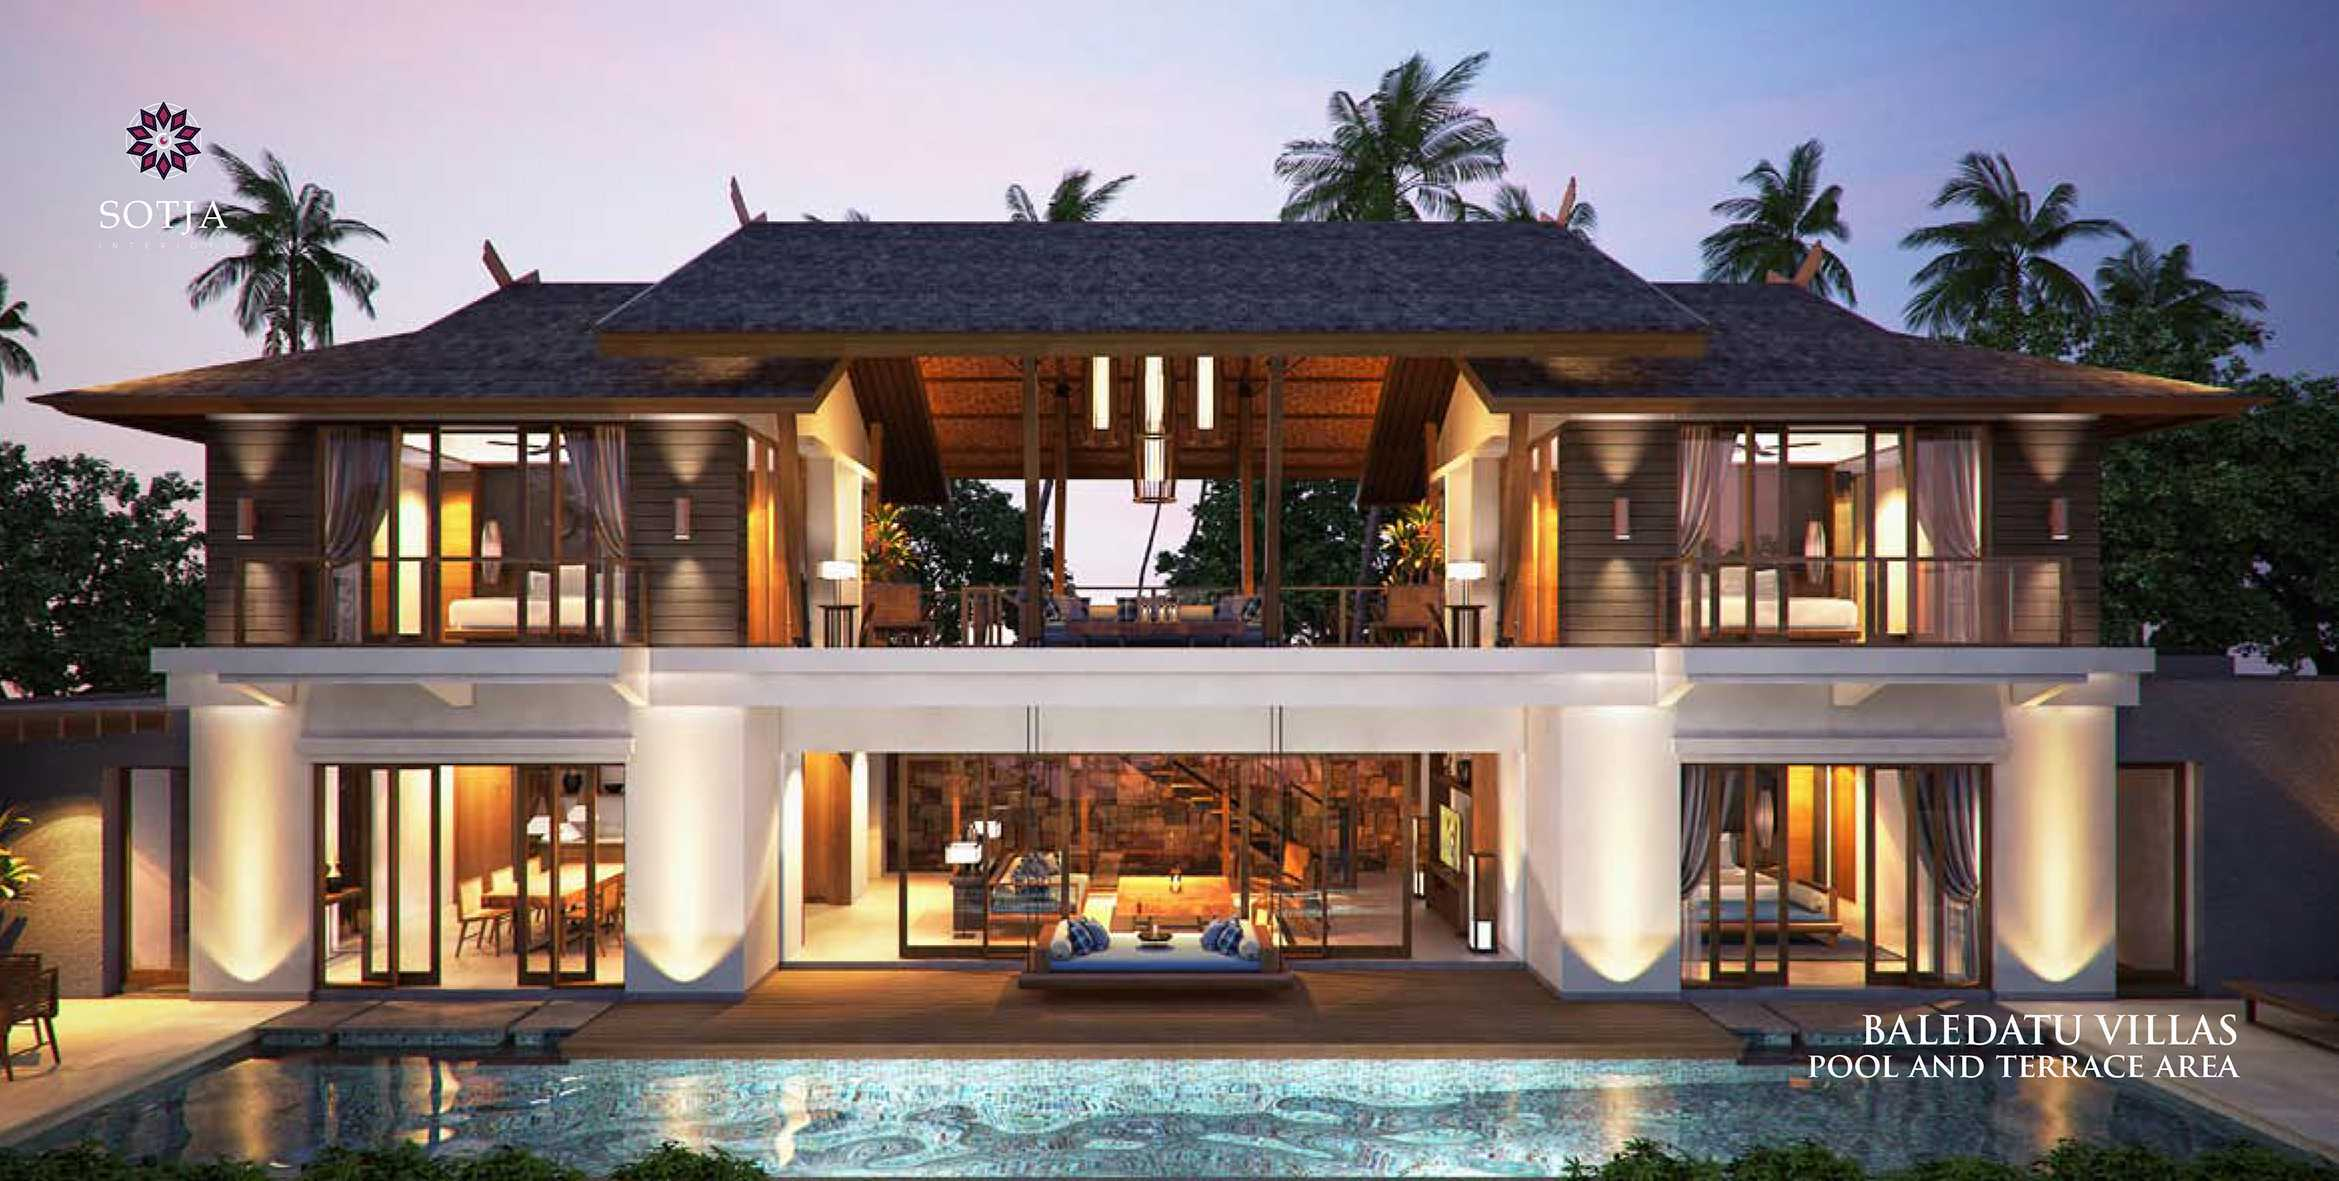 Sotja Interiors Baledatu Villas At Senggigi Lombok, Indonesia Lombok, Indonesia Back View   9912